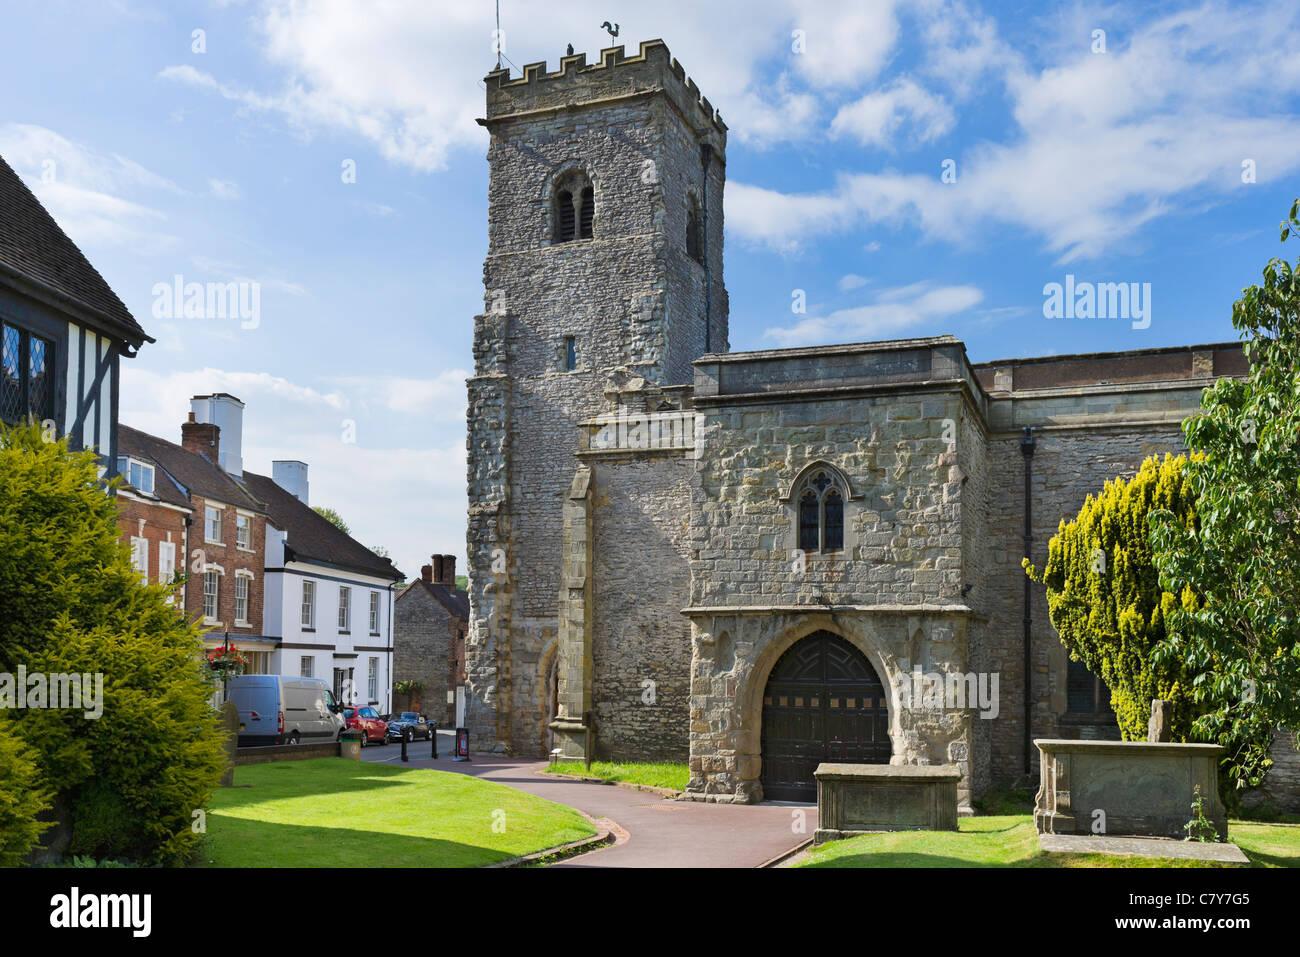 L'église Holy Trinity, dans le village de Much Wenlock, Shropshire, England, UK Photo Stock